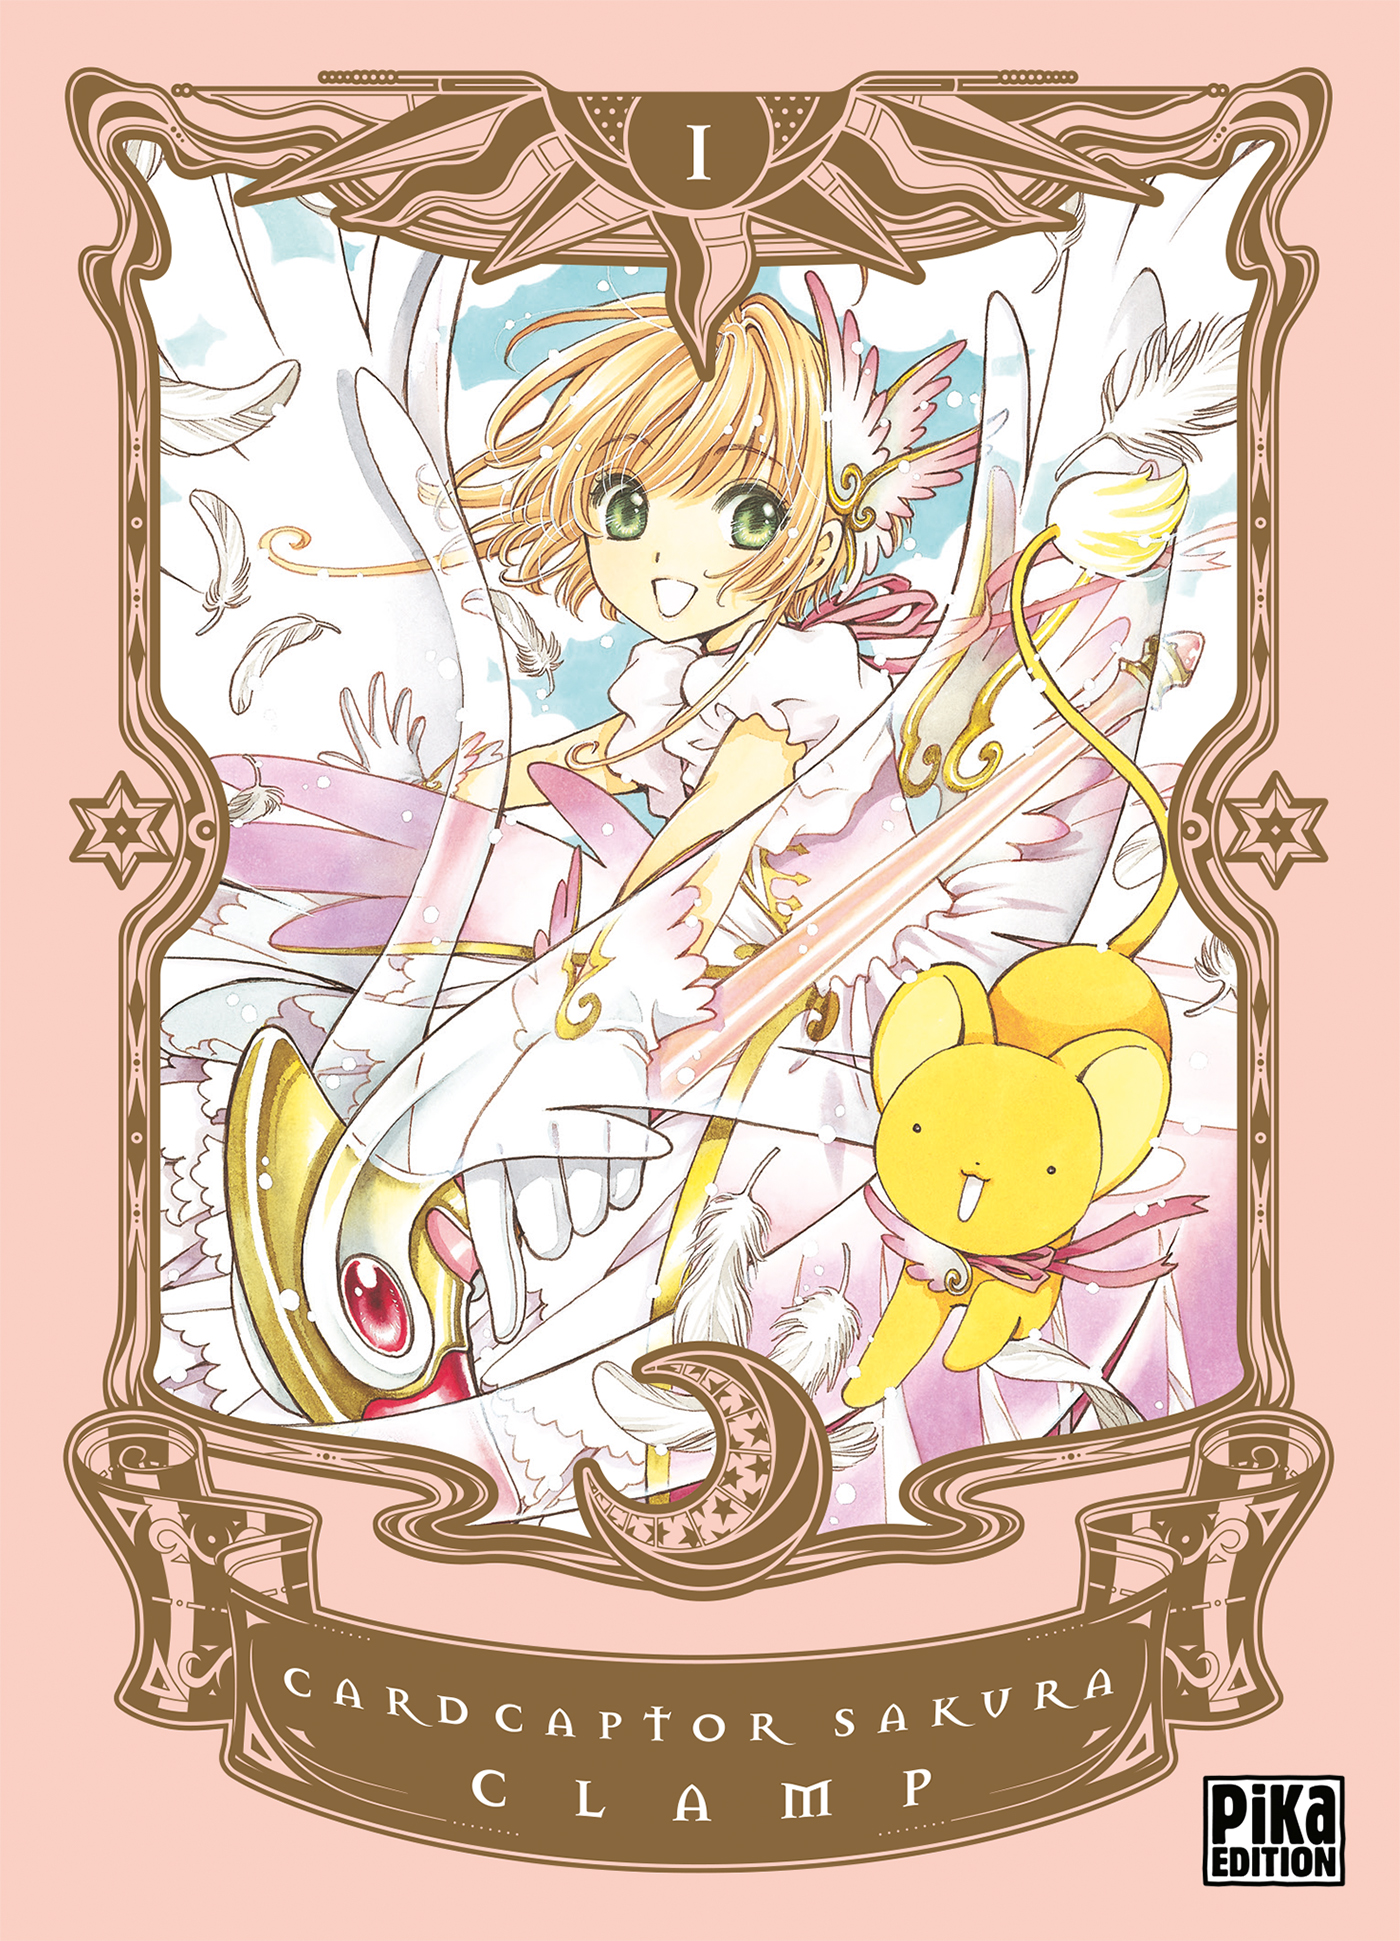 Vos achats d'otaku et vos achats ... d'otaku ! - Page 20 Card-captor-sakura-manga-volume-1-edition-2017-240346